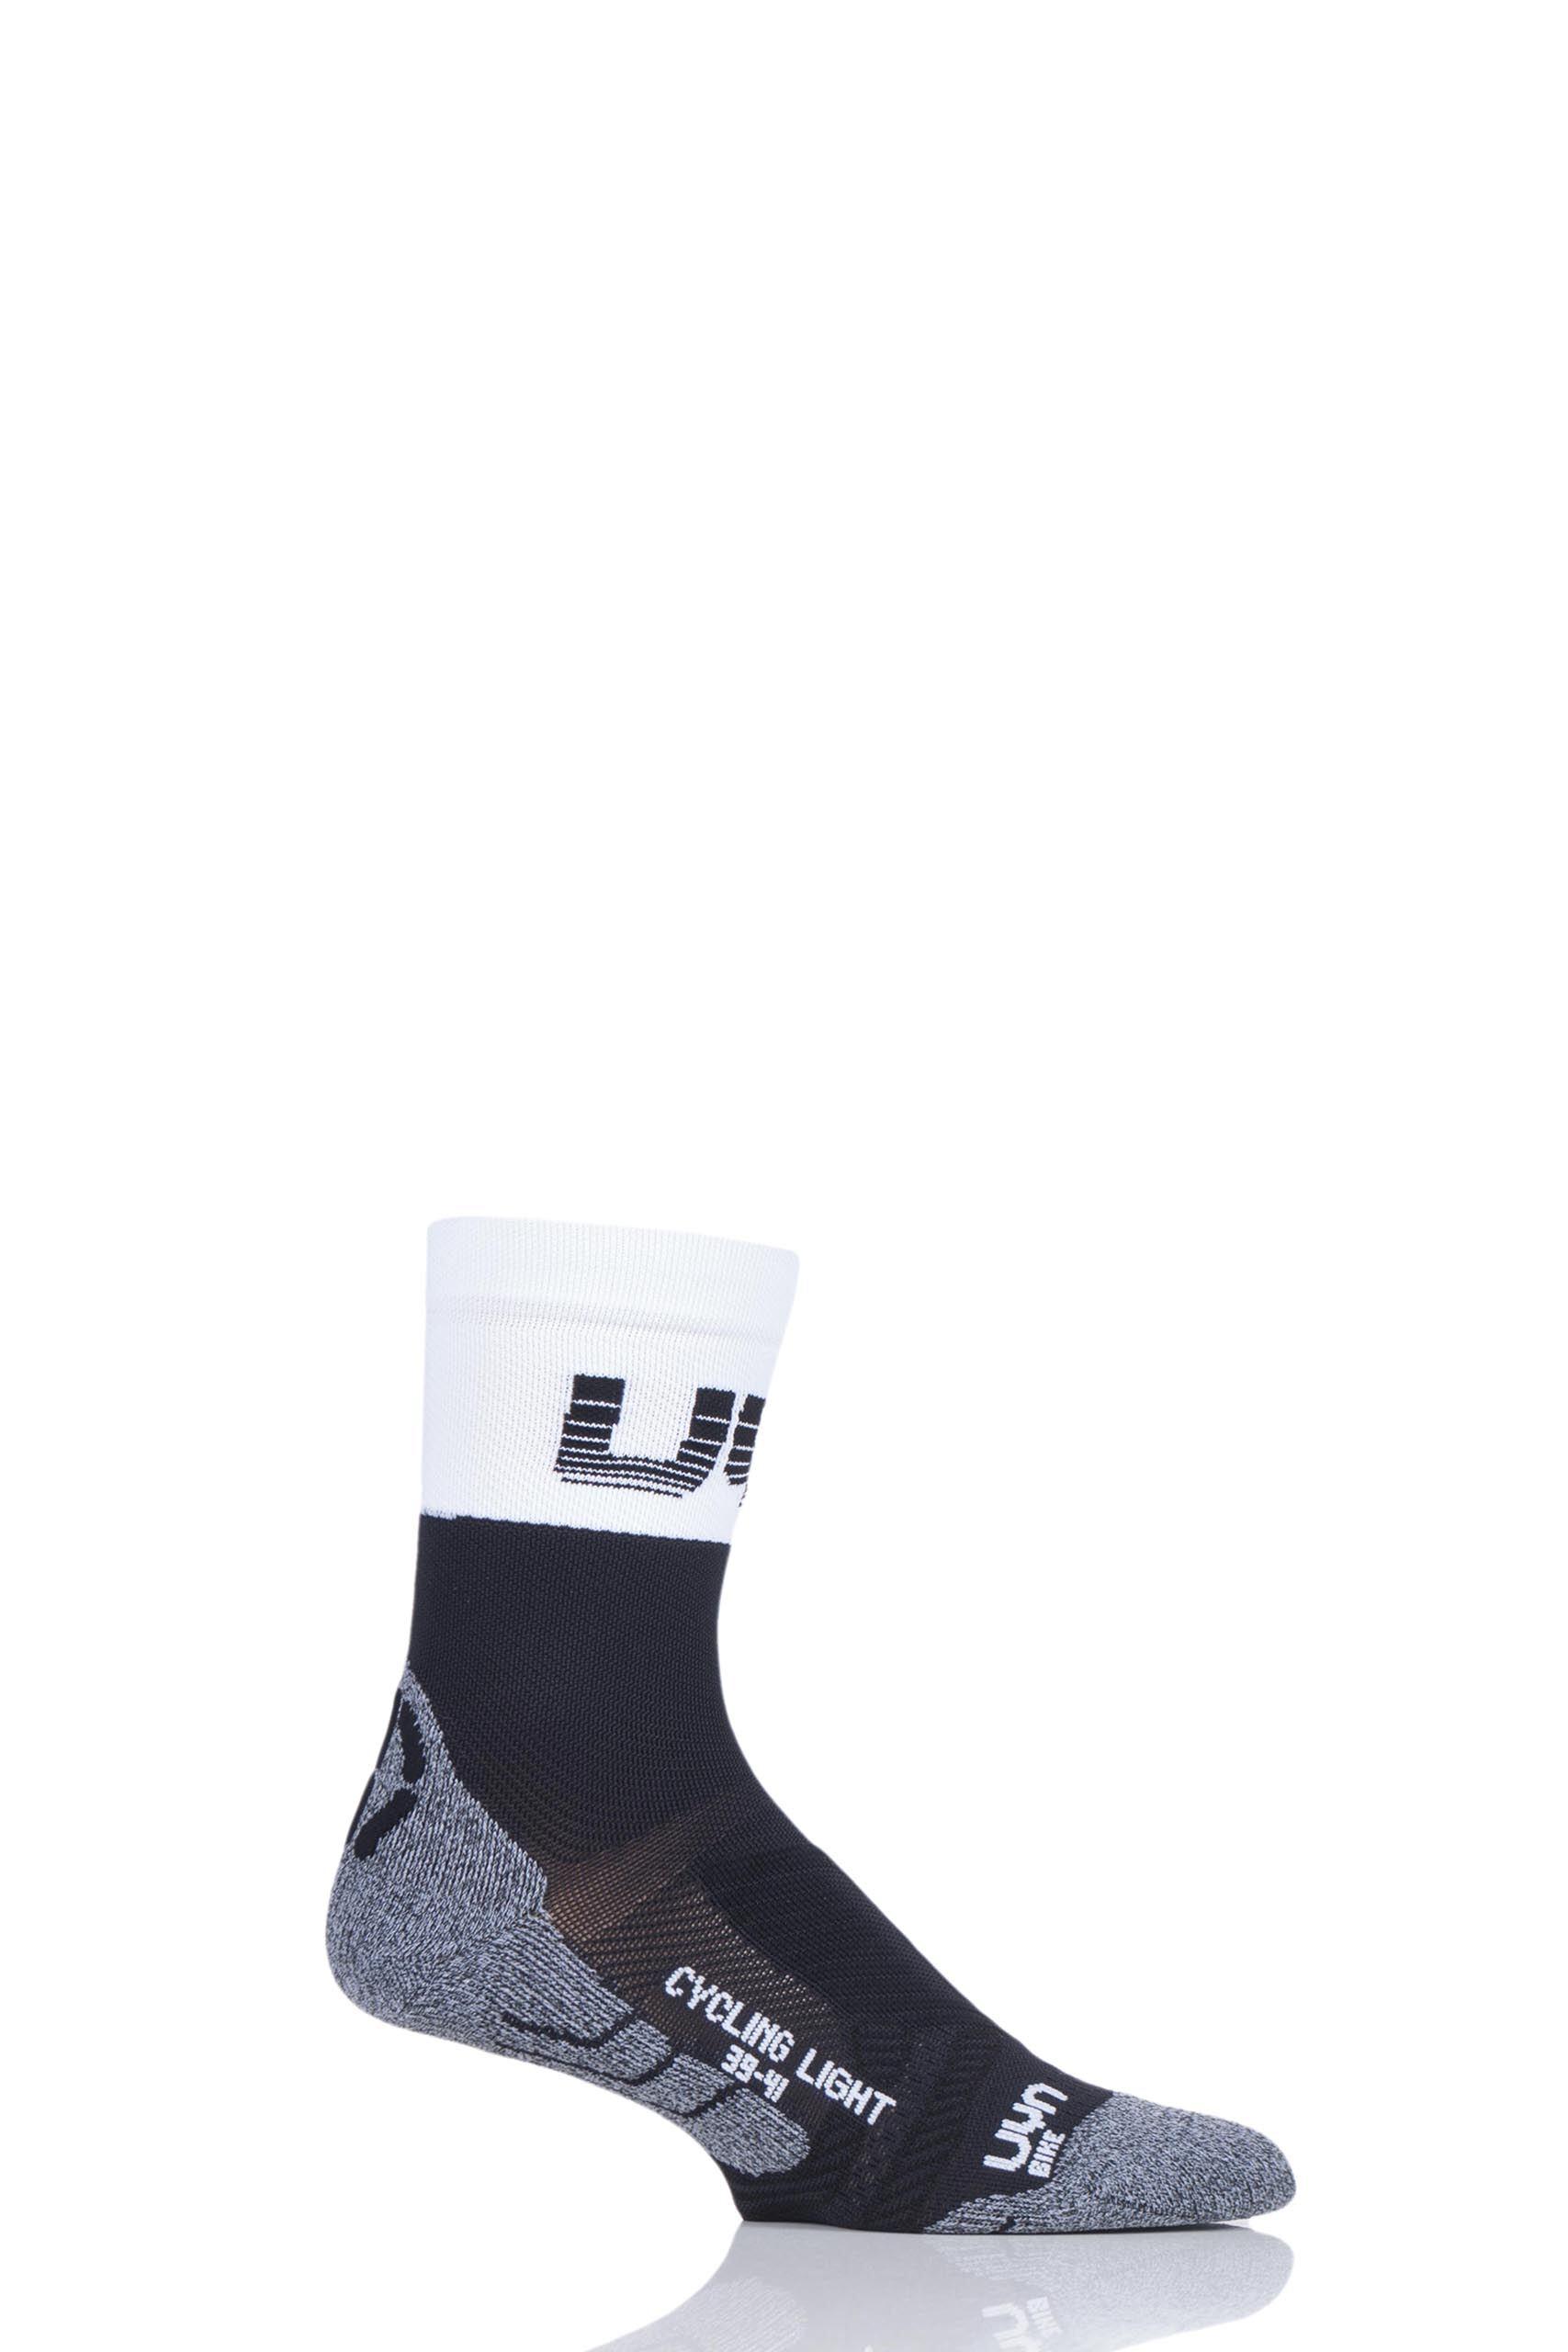 Image of 1 Pair Black Cycling Light Weight Socks Men's 6-7.5 Mens - UYN